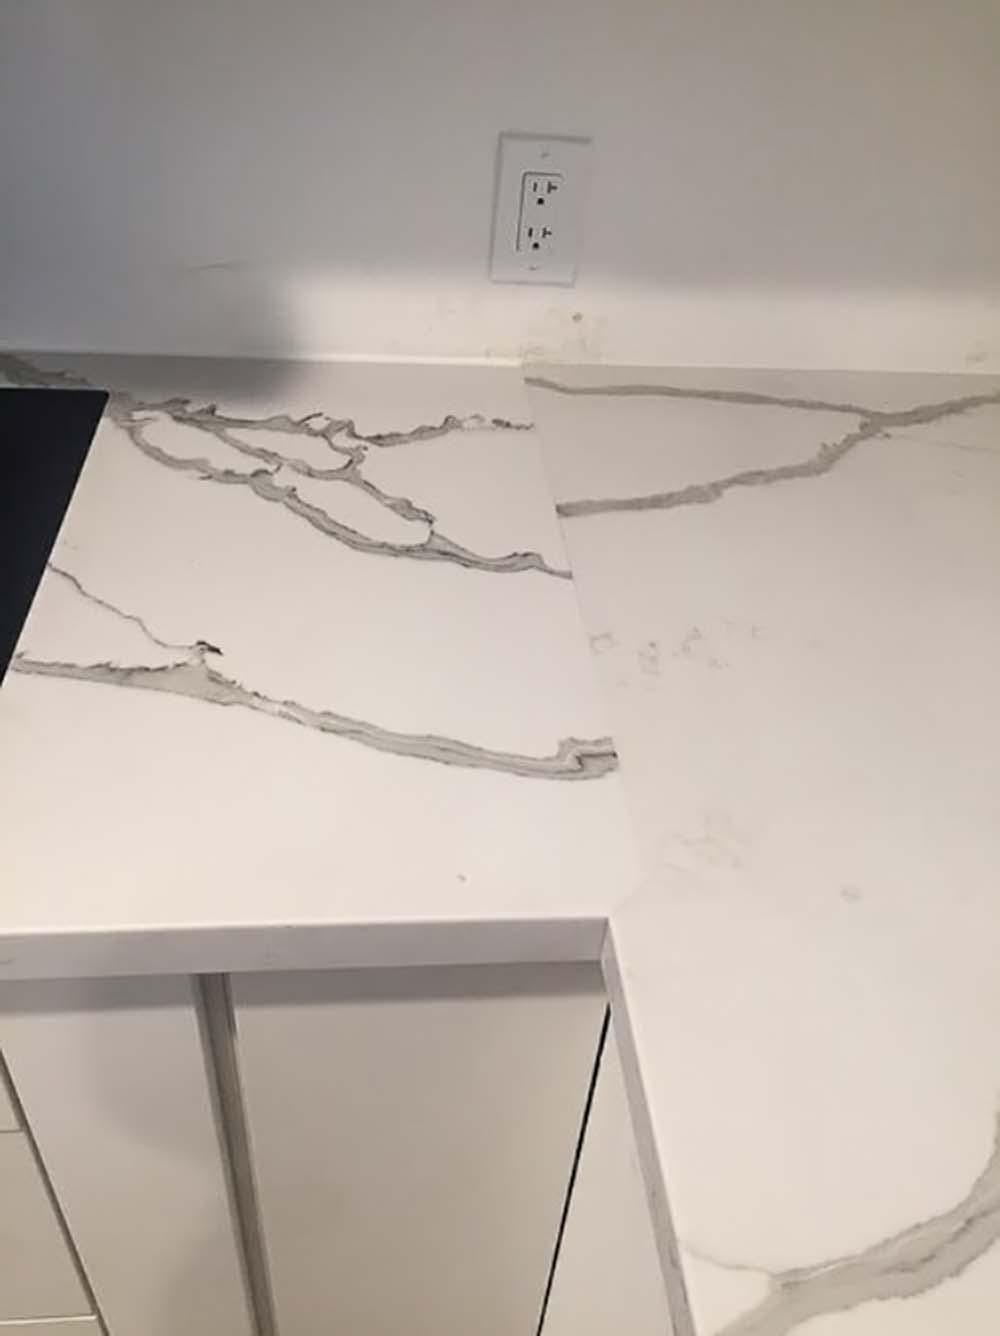 quartz-worktops-slab-variation-155518